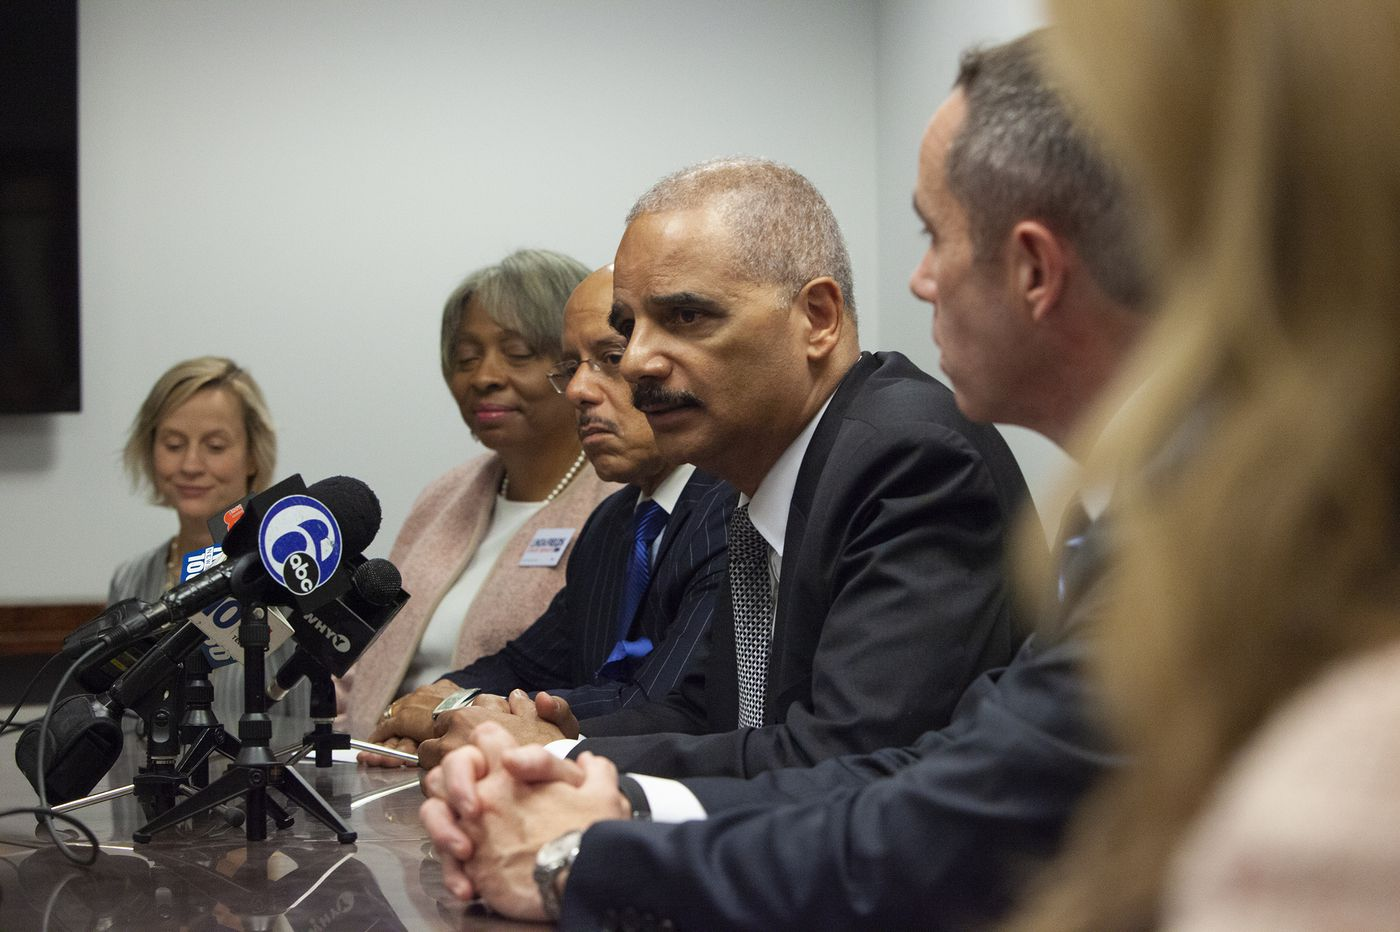 Former AG Eric Holder visits Philadelphia to stump for Dems, talk redistricting